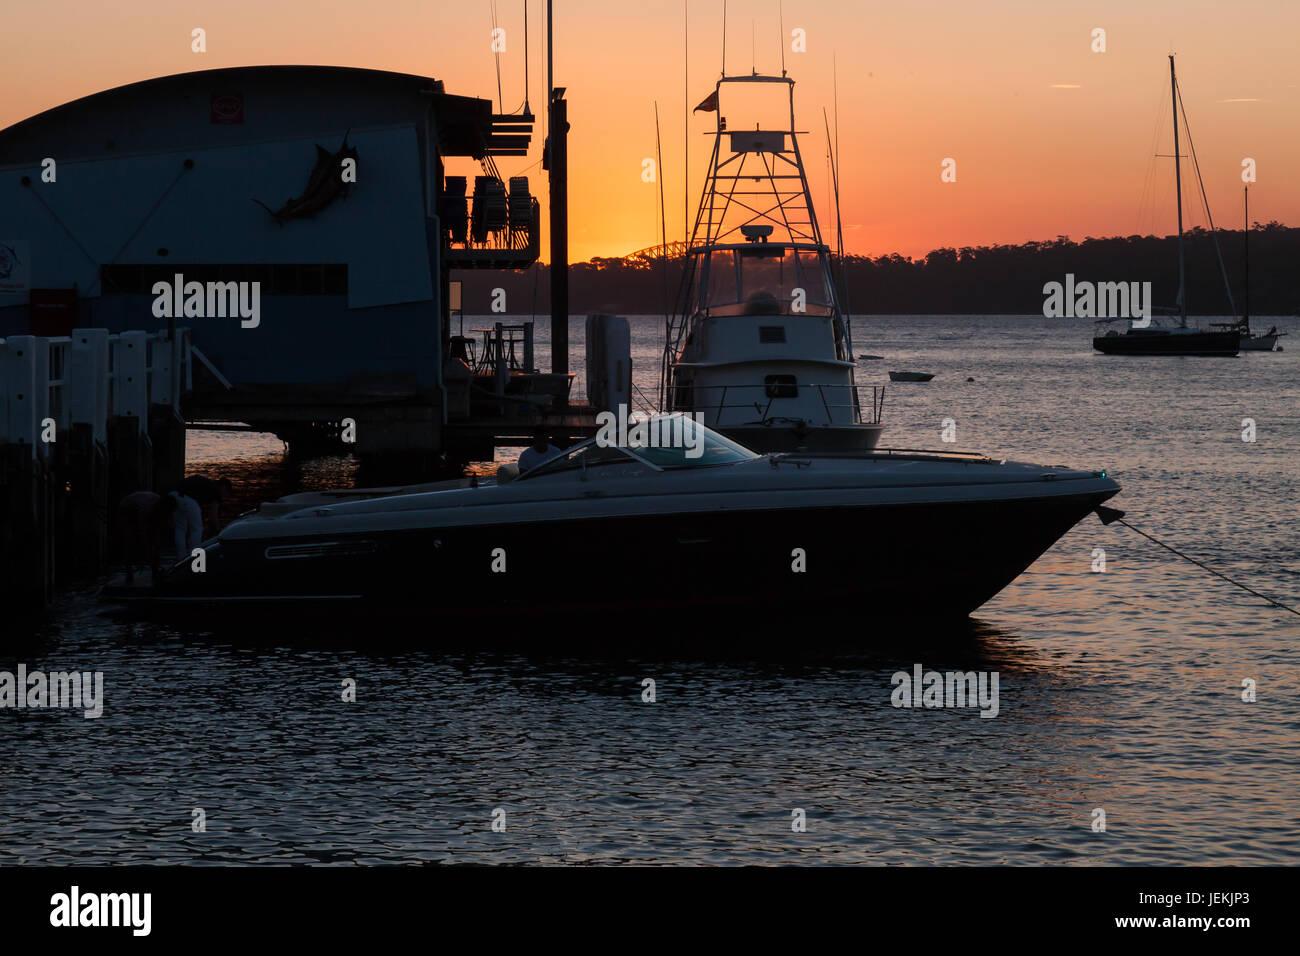 Boats moored at Watsons Bay Ferry Wharf, Sydney, Australia. - Stock Image